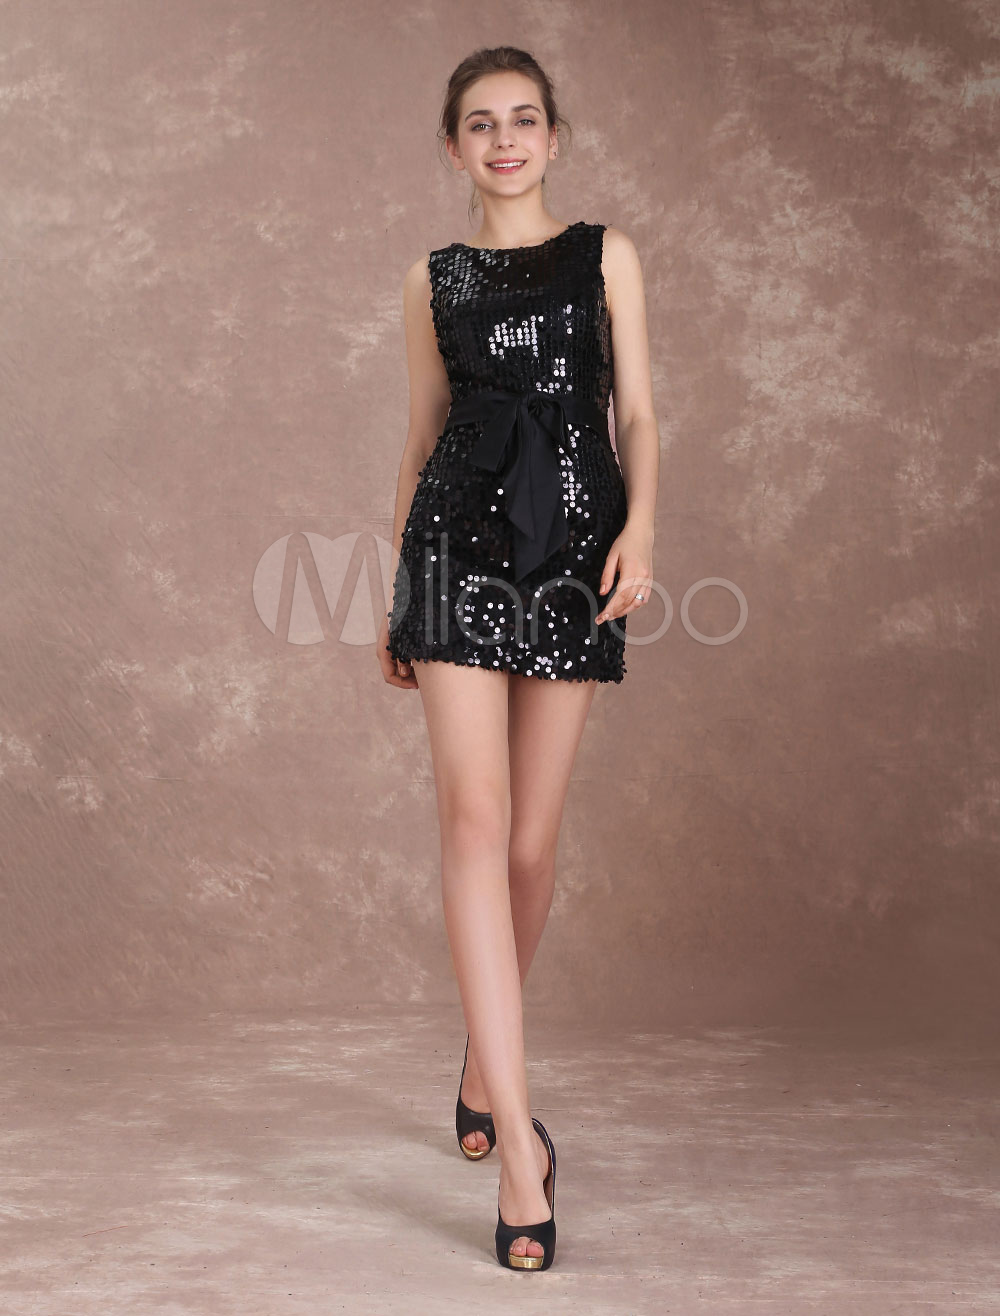 Buy Sequin Cocktail Dresses Black Sheath Column Short Ribbon Sash Mini Party Dresses for $92.39 in Milanoo store